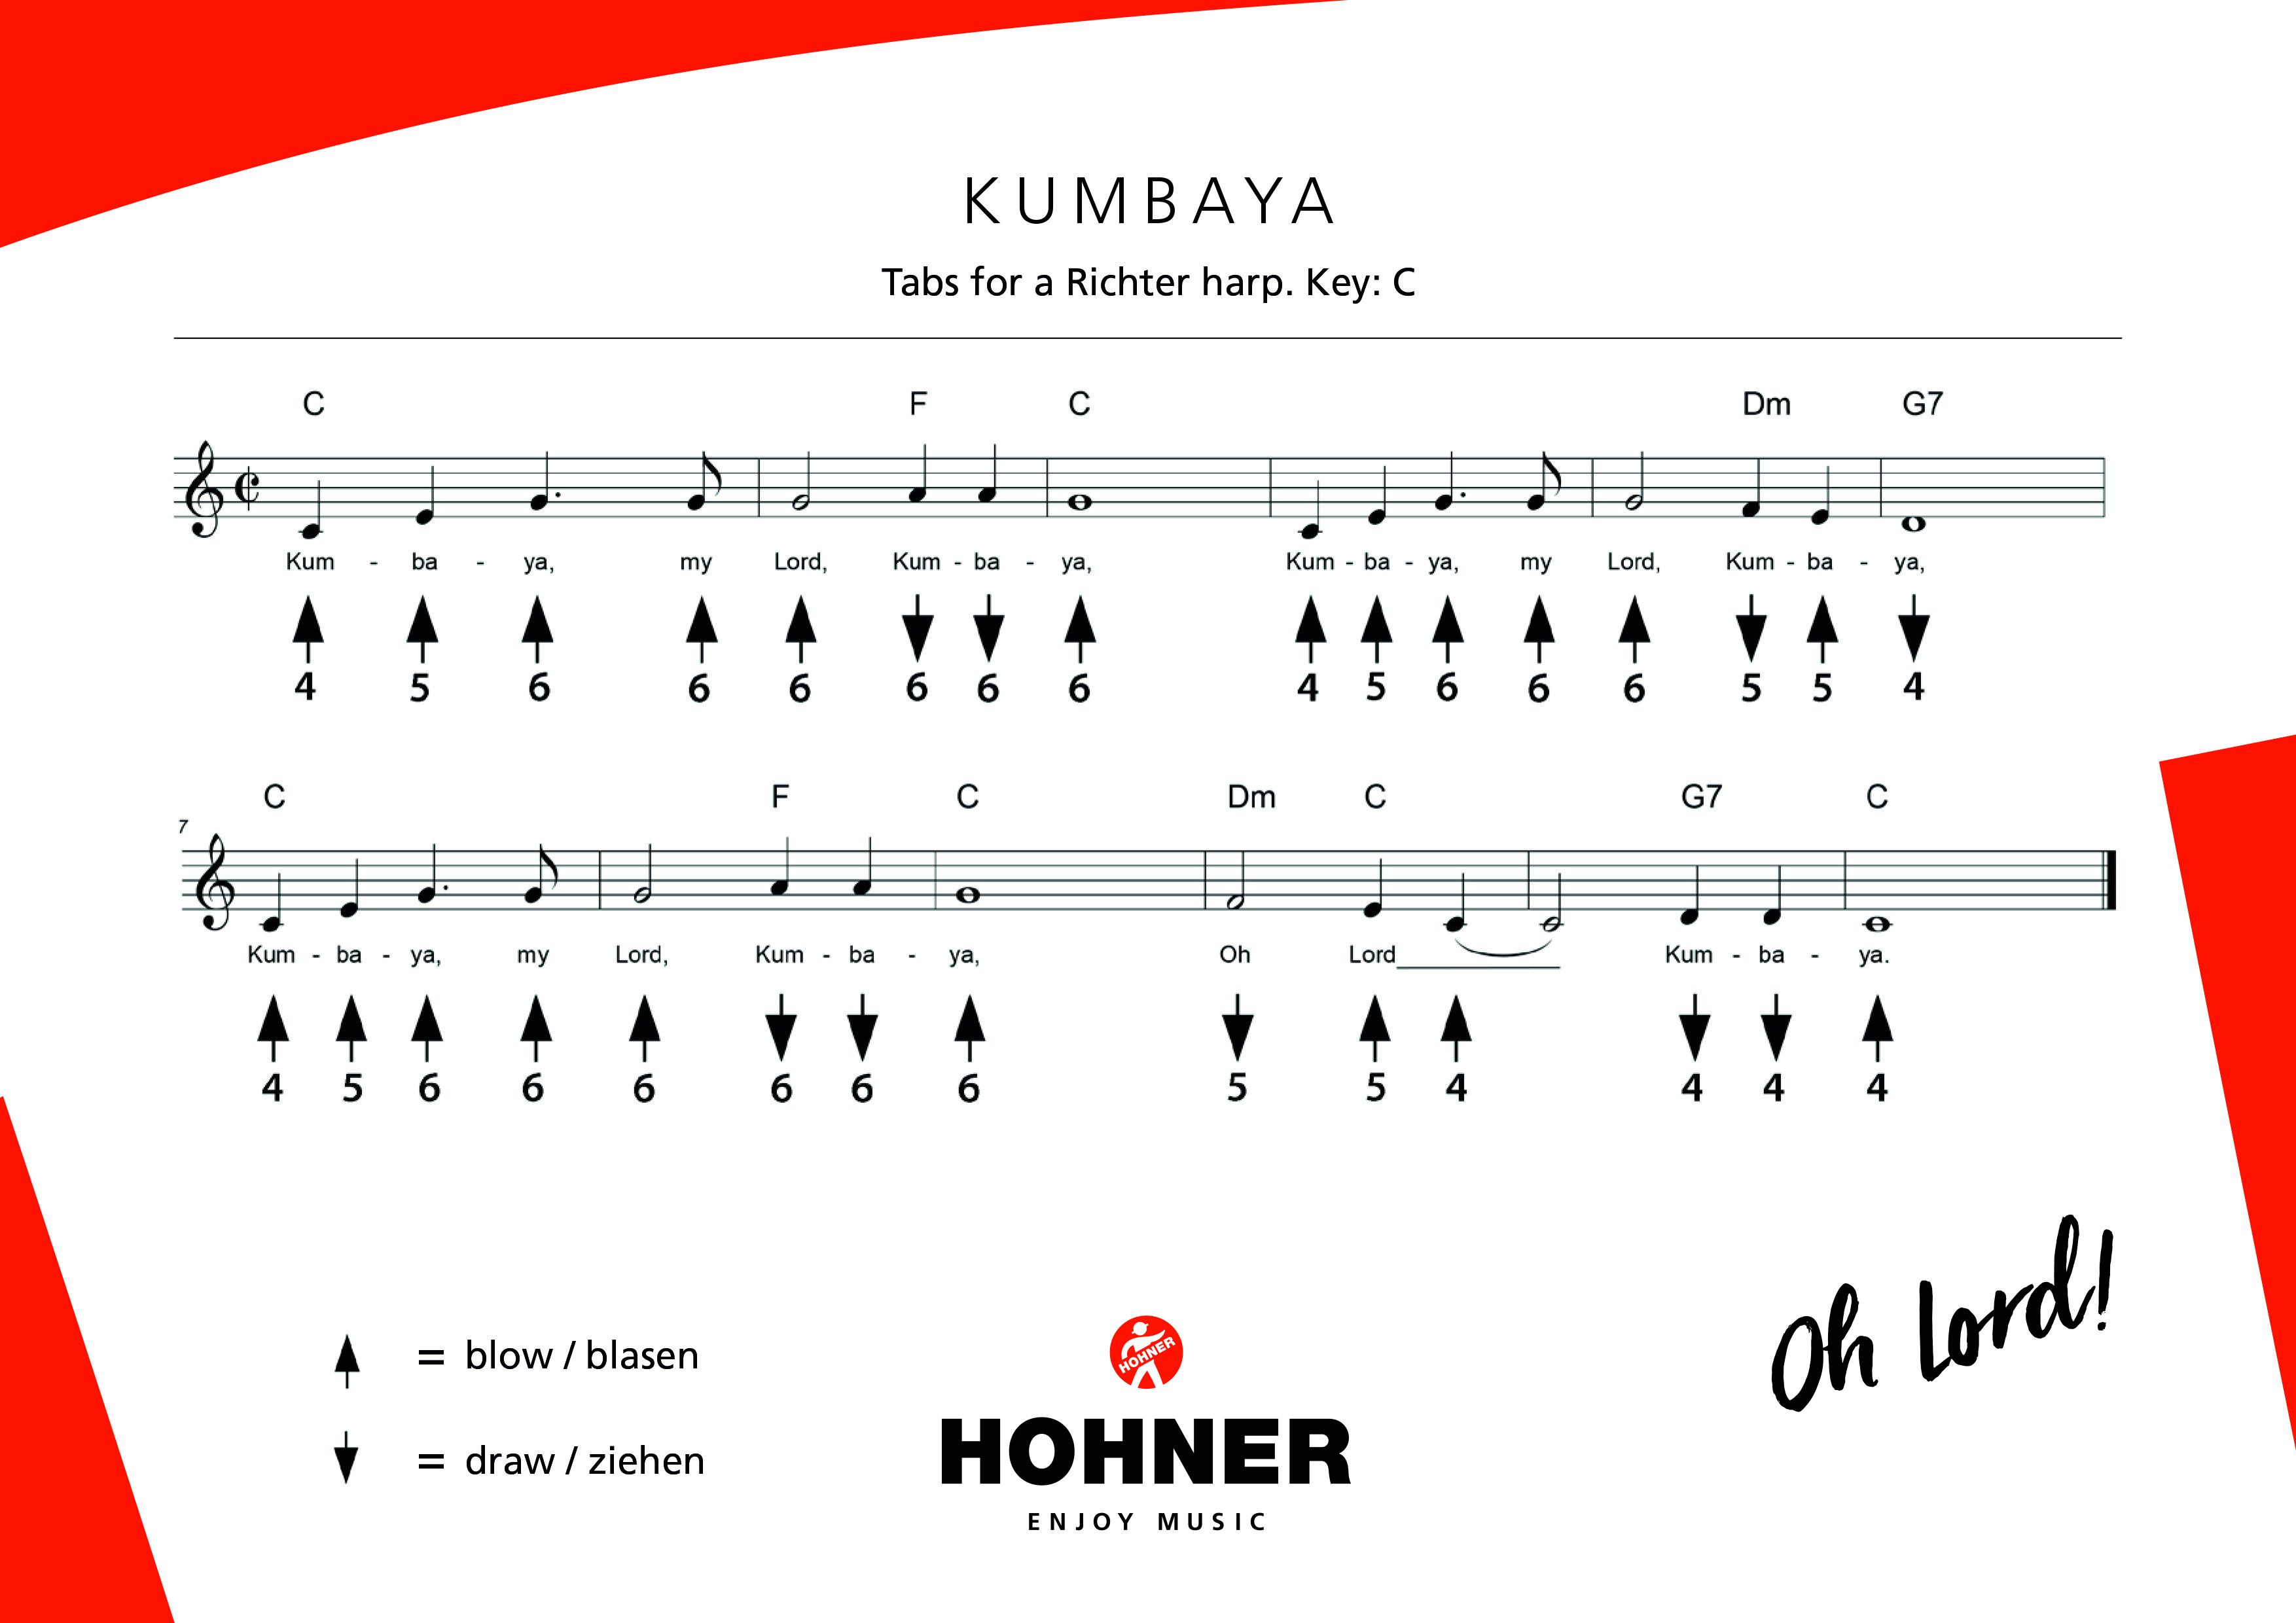 Tabs for harmonica - Tabs & Sheet music - HOHNER - enjoy music